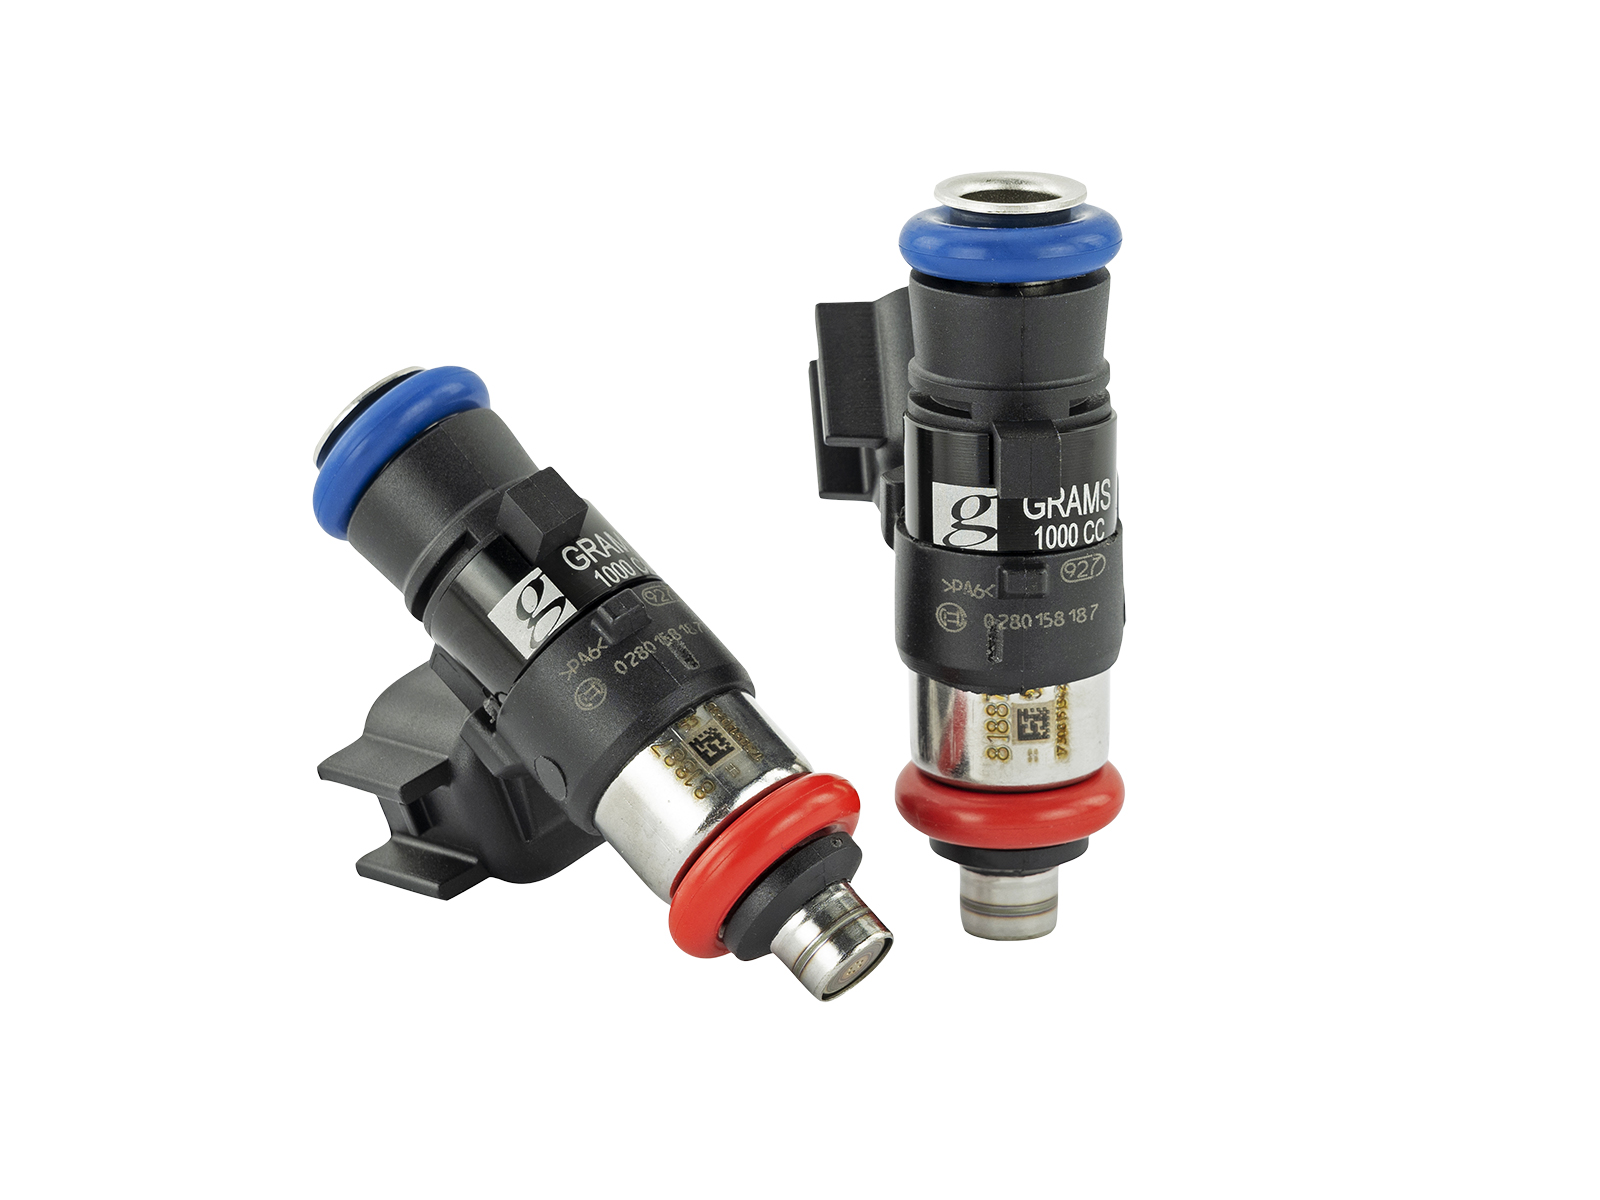 KraftWerks 1000cc Injector Upgrade Polaris RZR 1000 XP, RZR 1000 XP4 2014-2020)